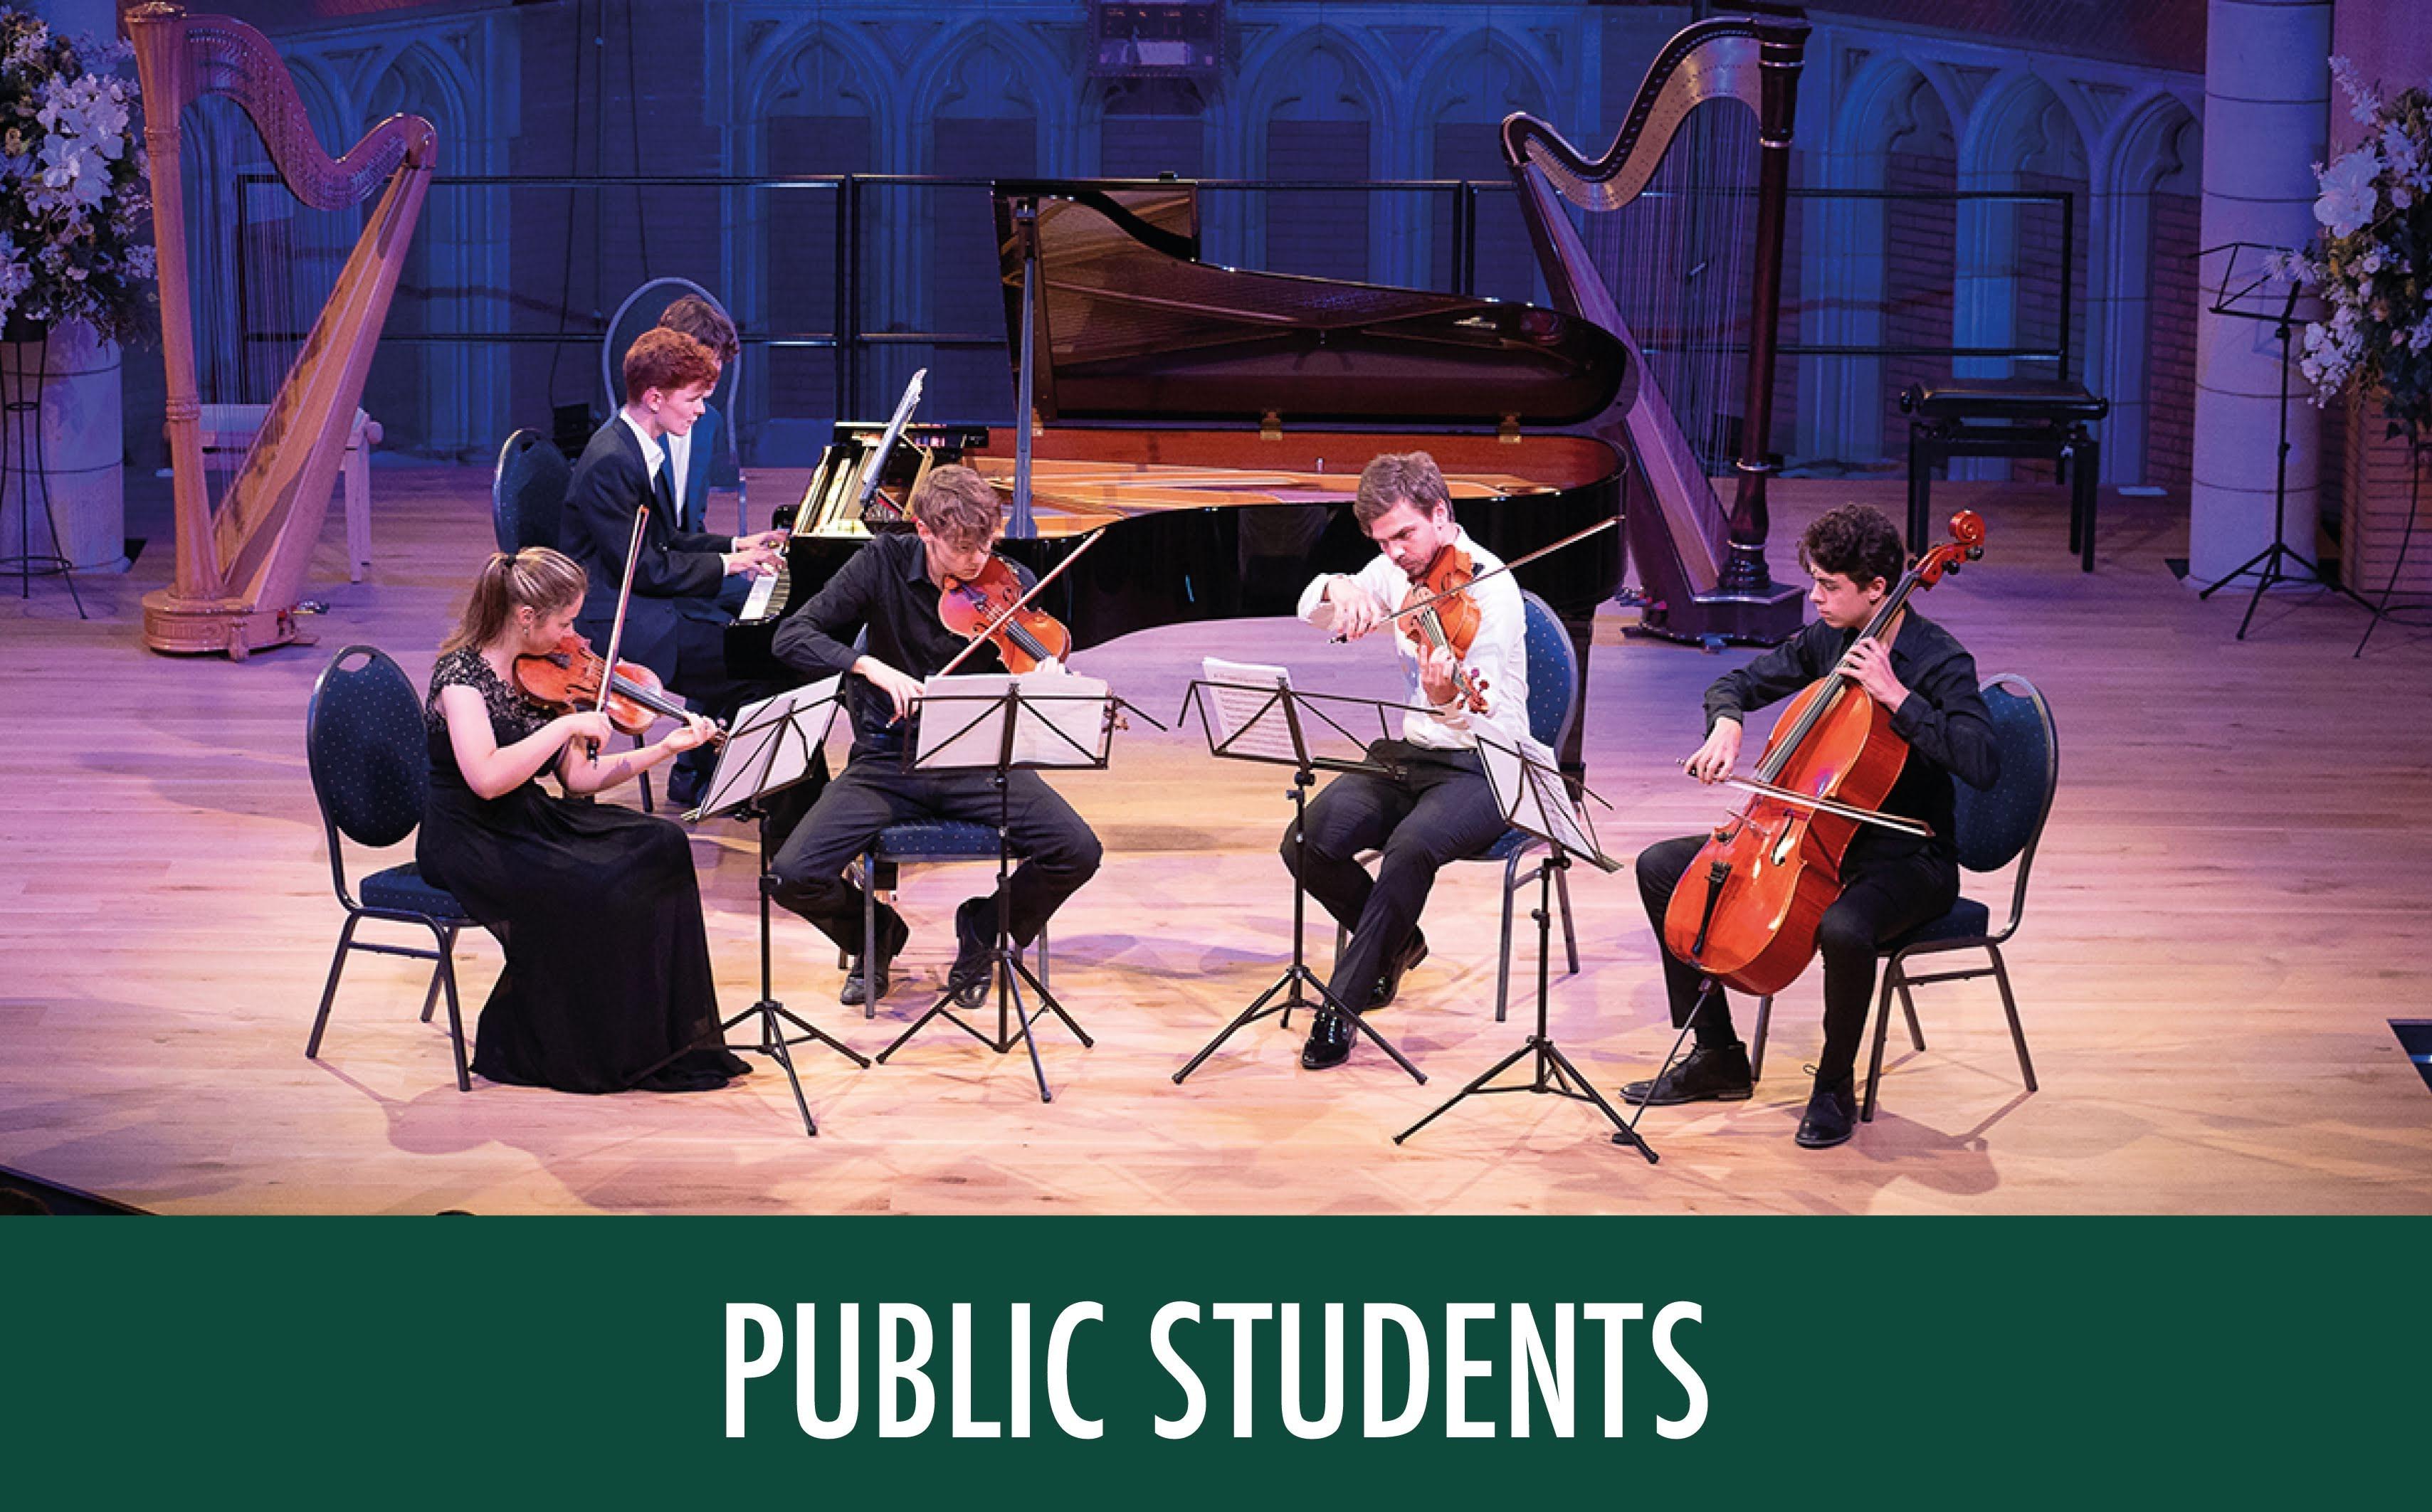 PUBLIC STUDENTS